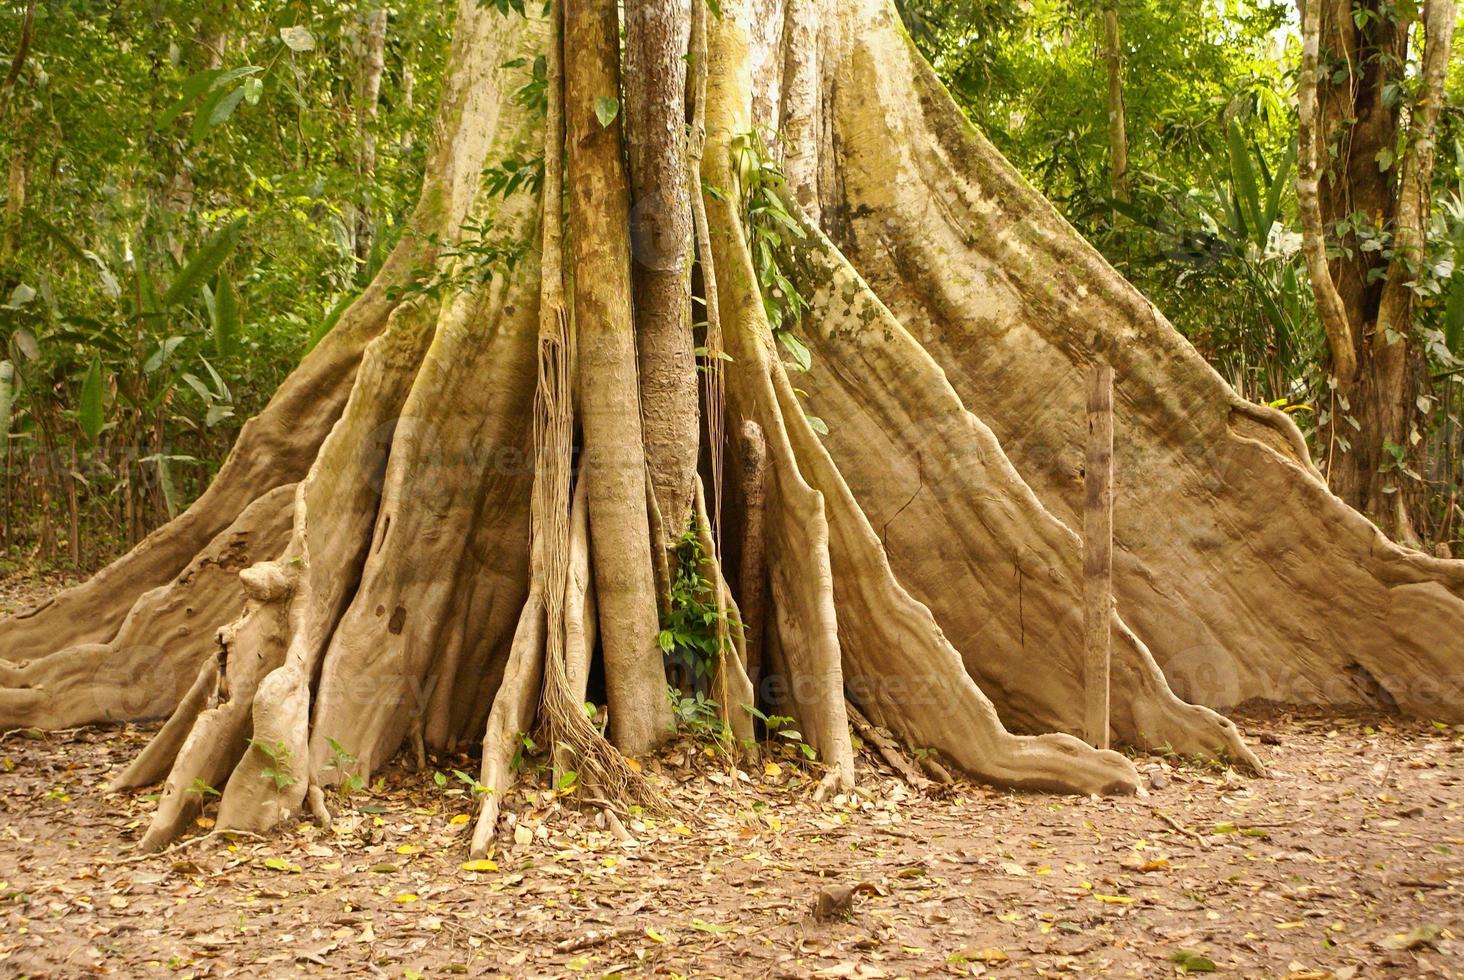 árvore da selva amazônica foto